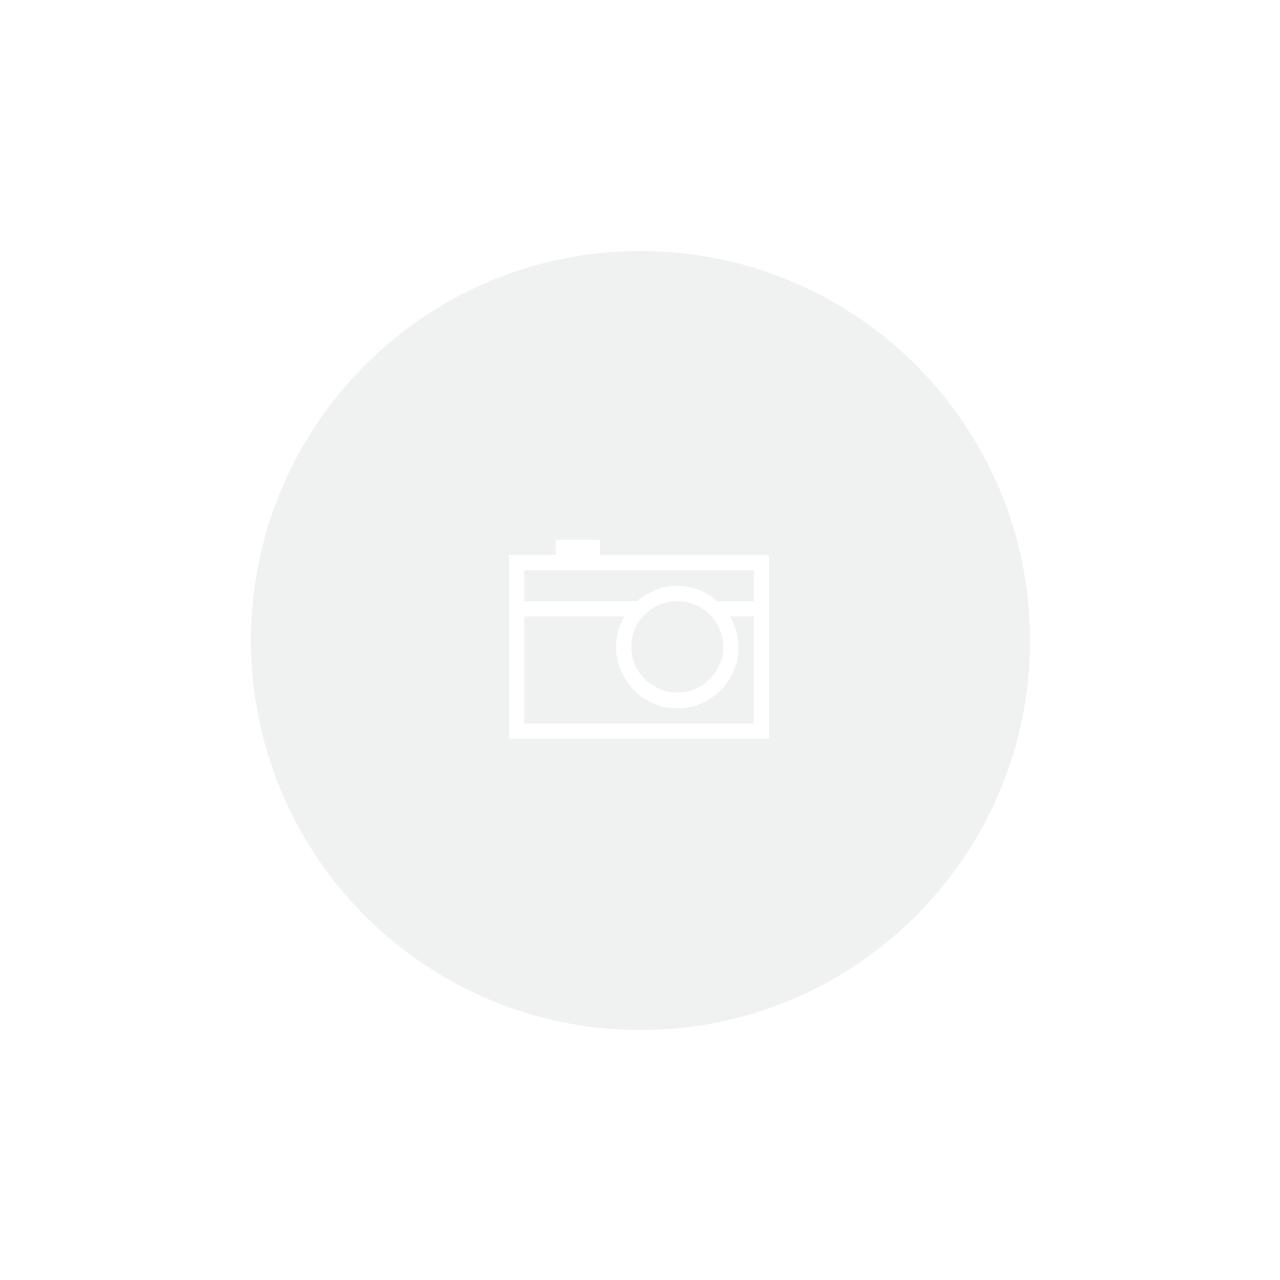 Espumante Salton Classic Seco 660 mL